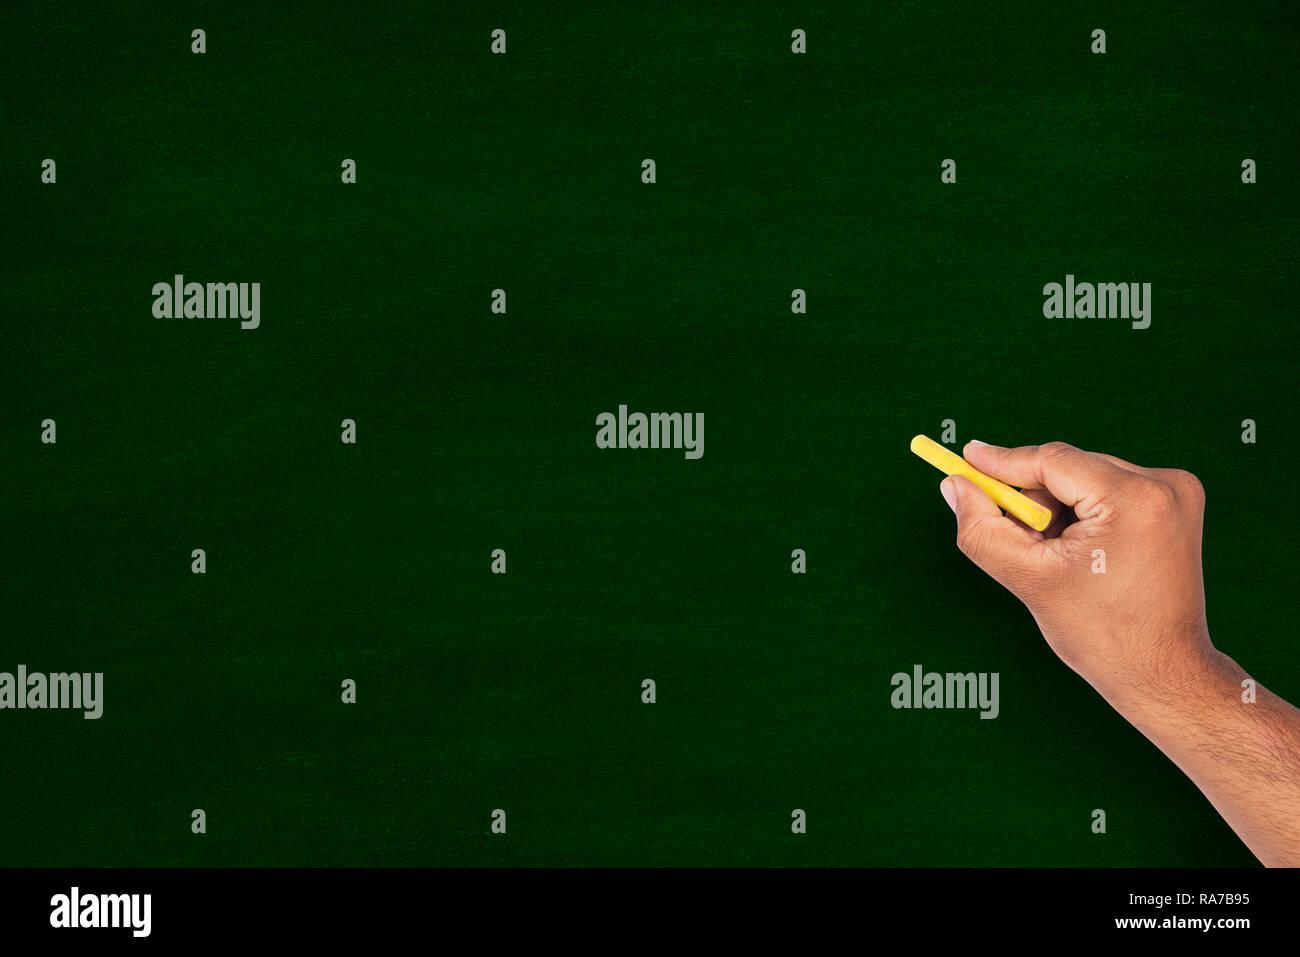 Hand writing on chalkboard / blackboard - Stock Image